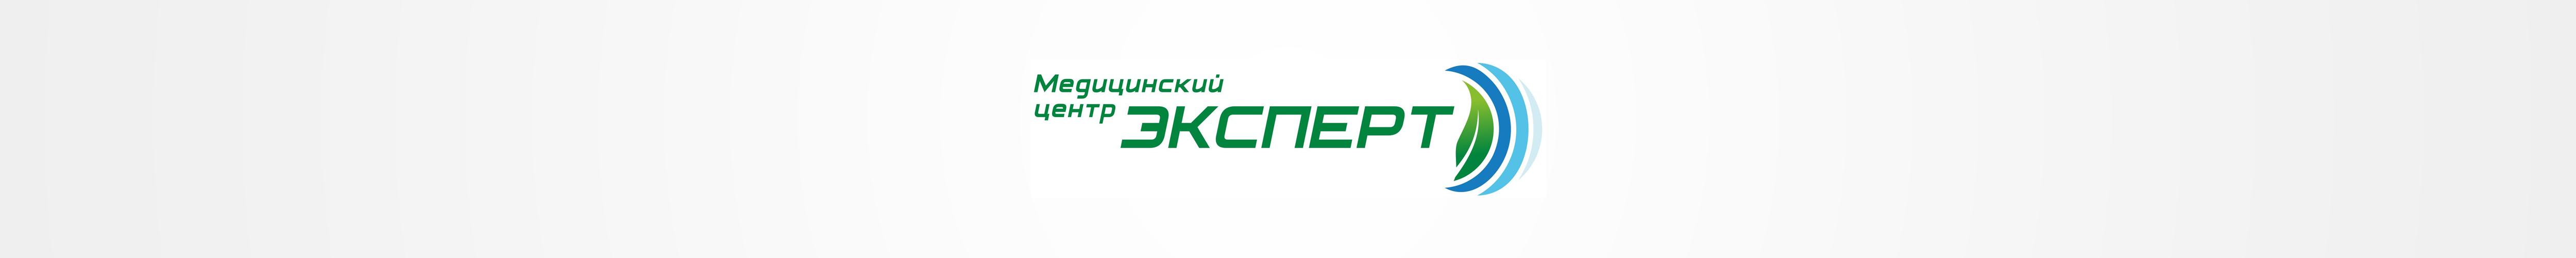 "МЦ ""Эксперт"" г. Балаково"